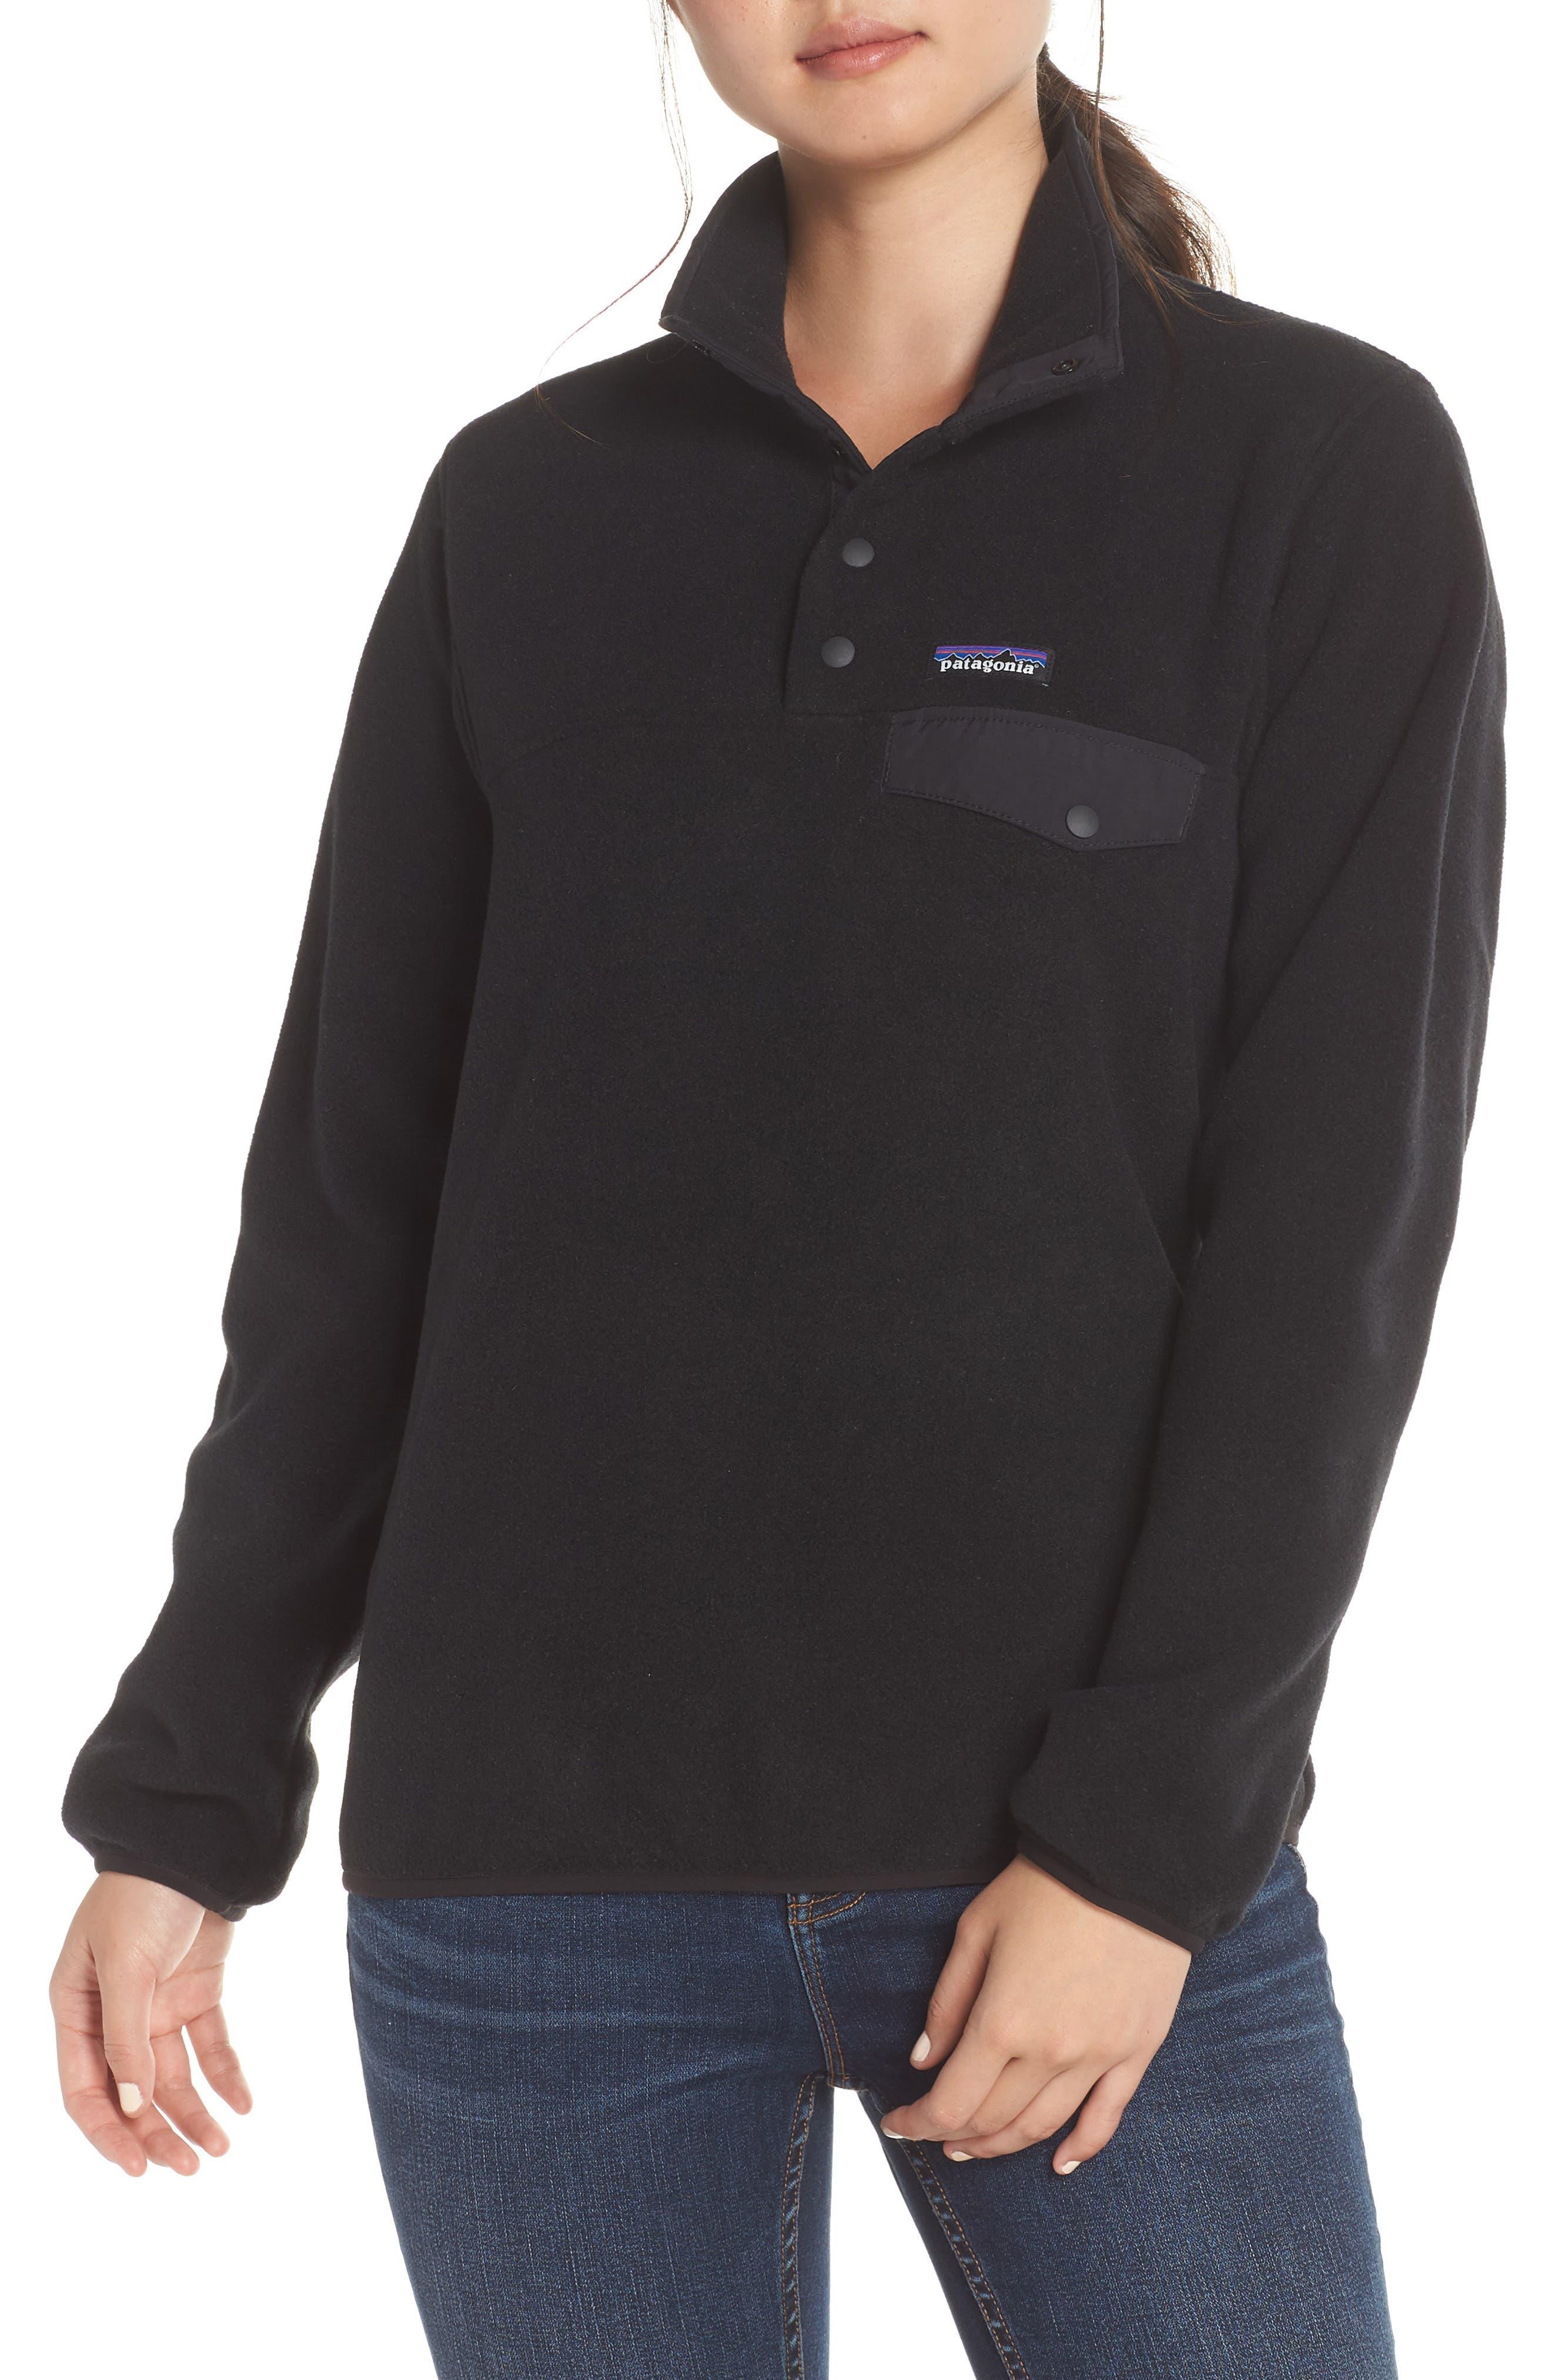 Synchilla Snap-T<sup>®</sup> Fleece Pullover,                             Main thumbnail 1, color,                             BLACK W/ BLACK